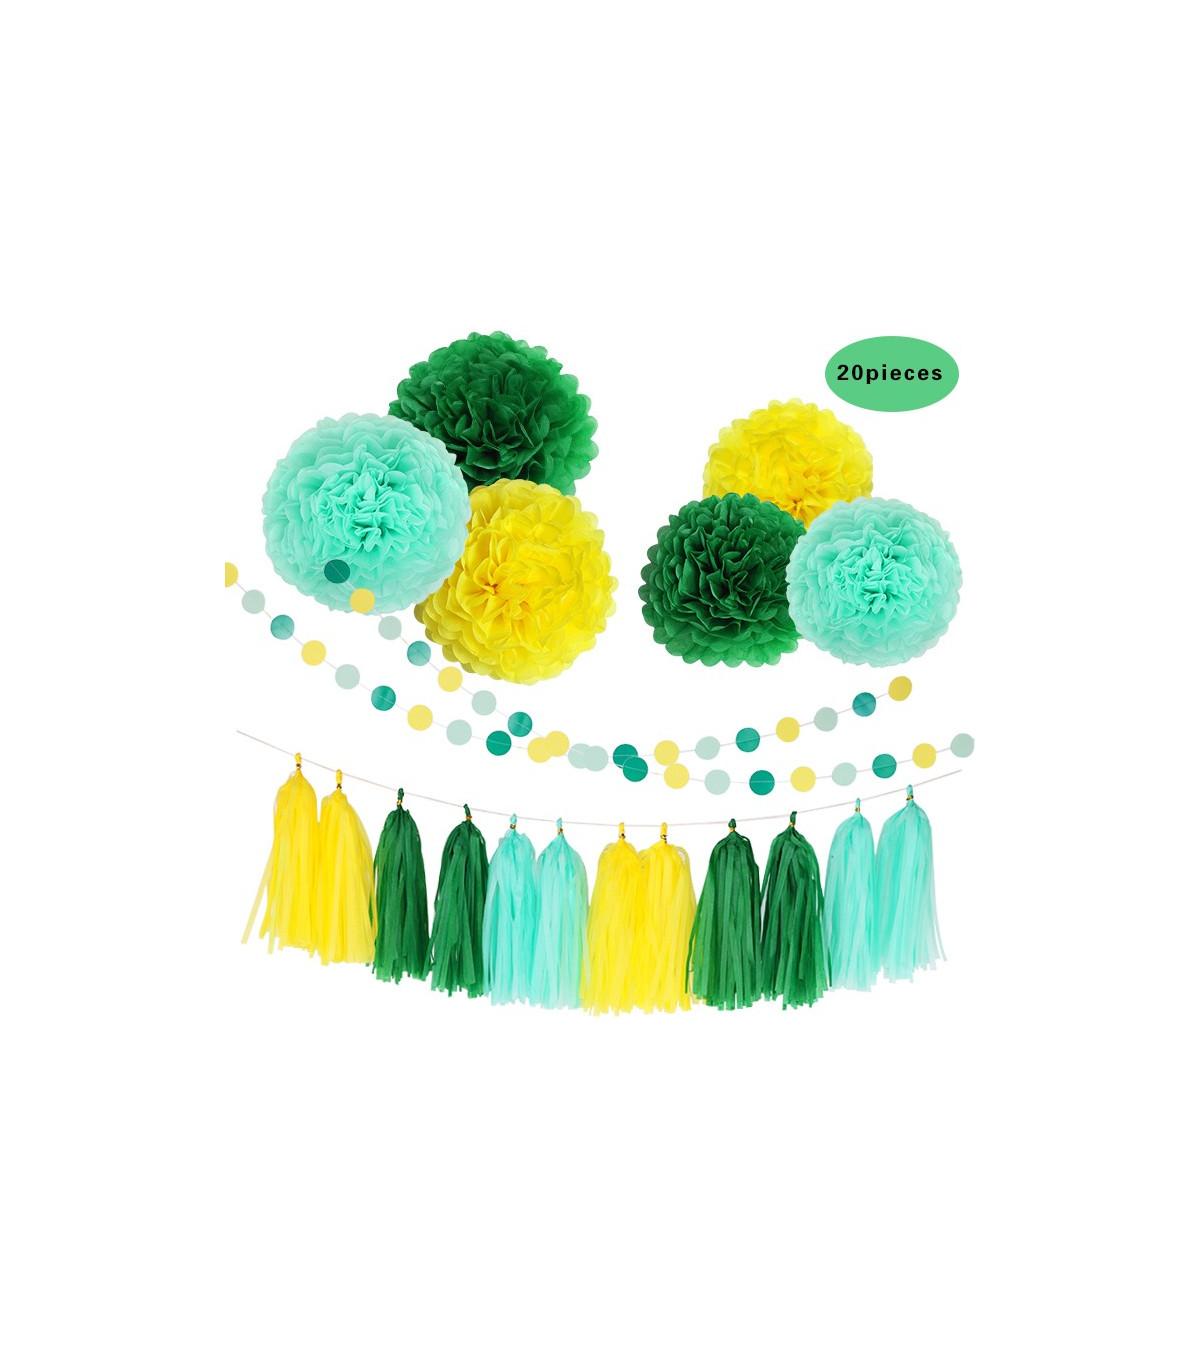 Deco Jaune Et Vert kit deco 20pcs jaune/bleu pastel/vert pompom,lampion